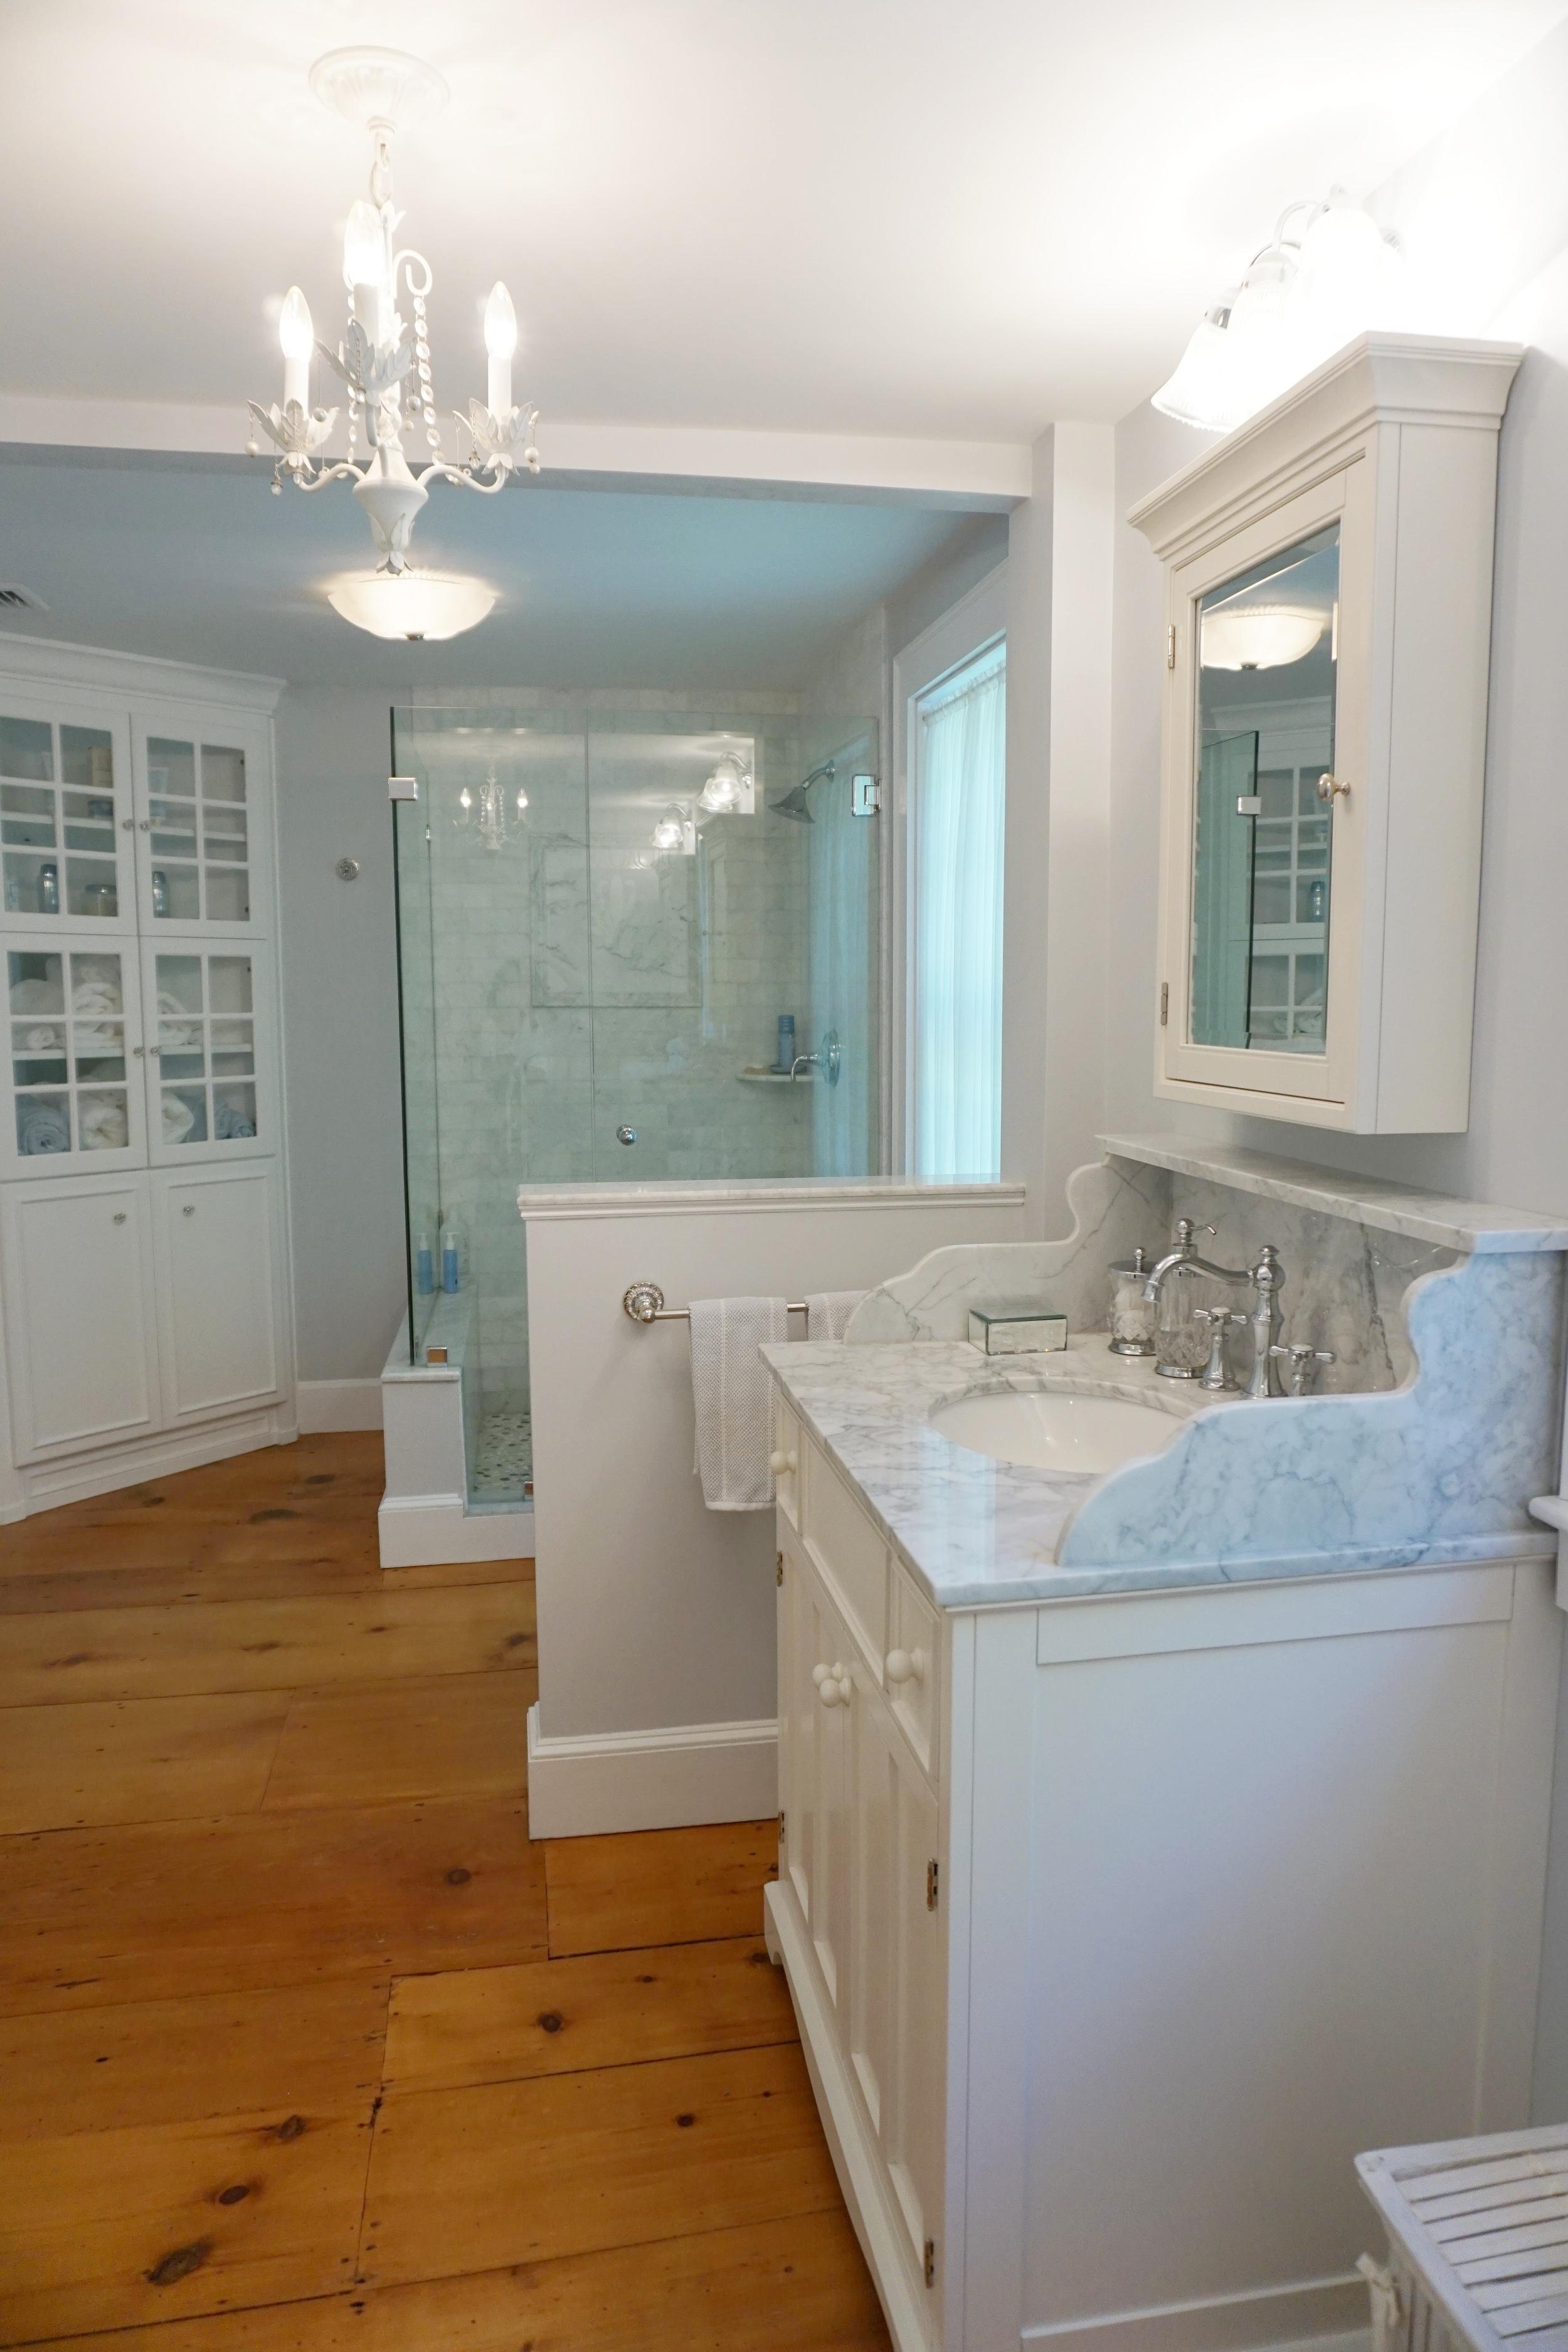 An elegant bathroom found on the second floor.